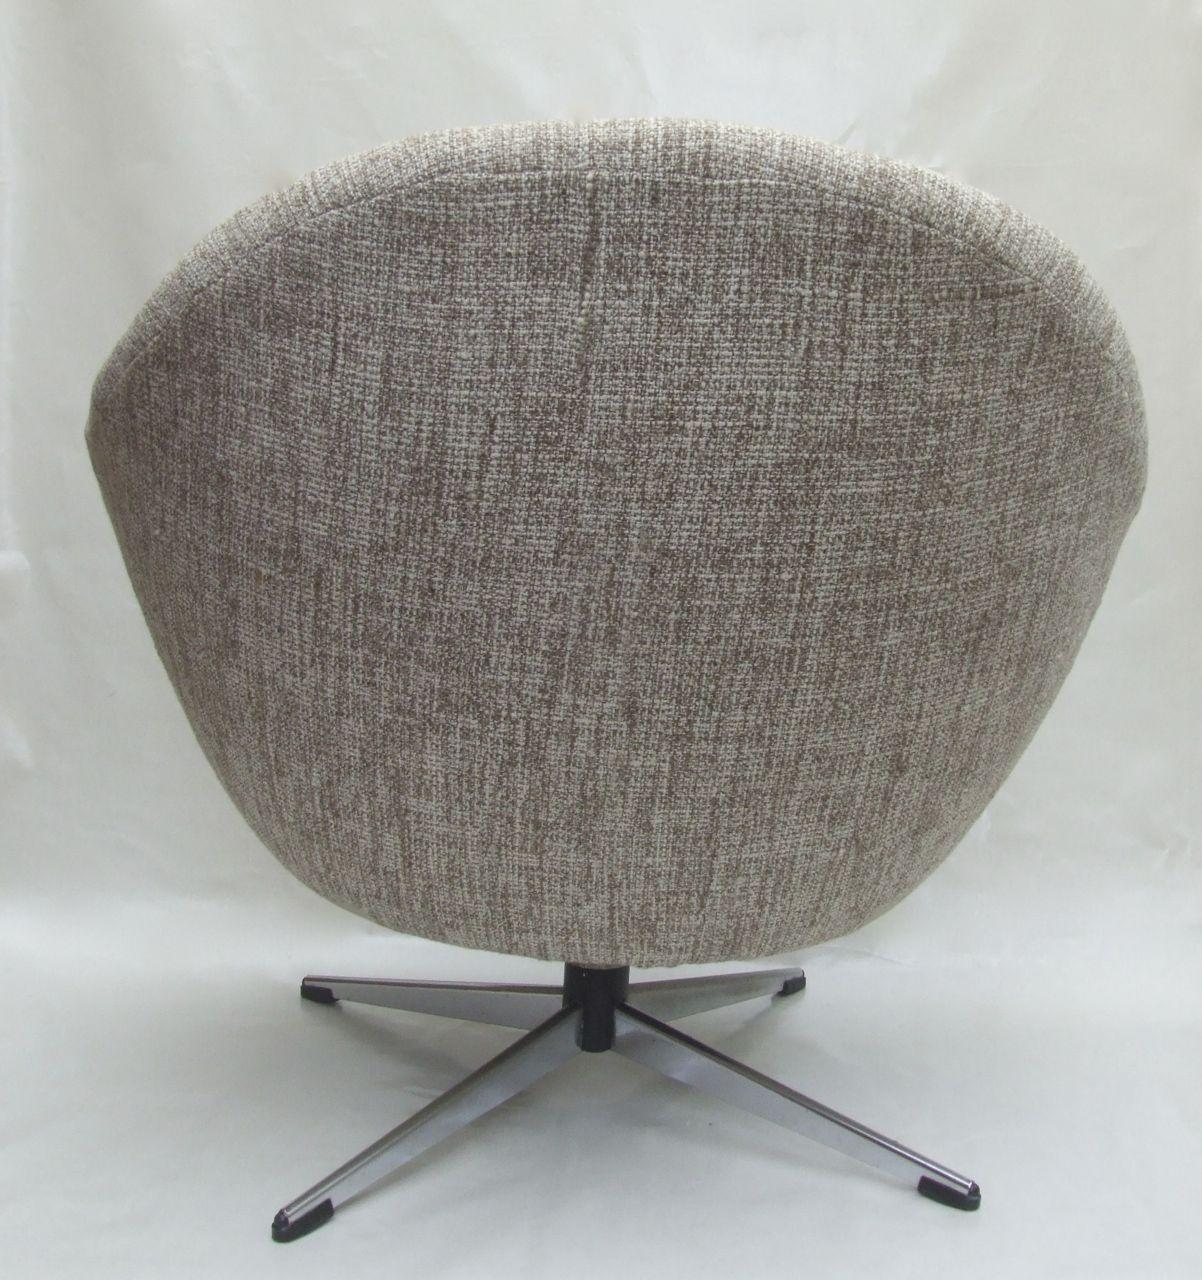 1960s Tub Chairs_swivel Base 1960s Tub Chairs3_swivel Base ...